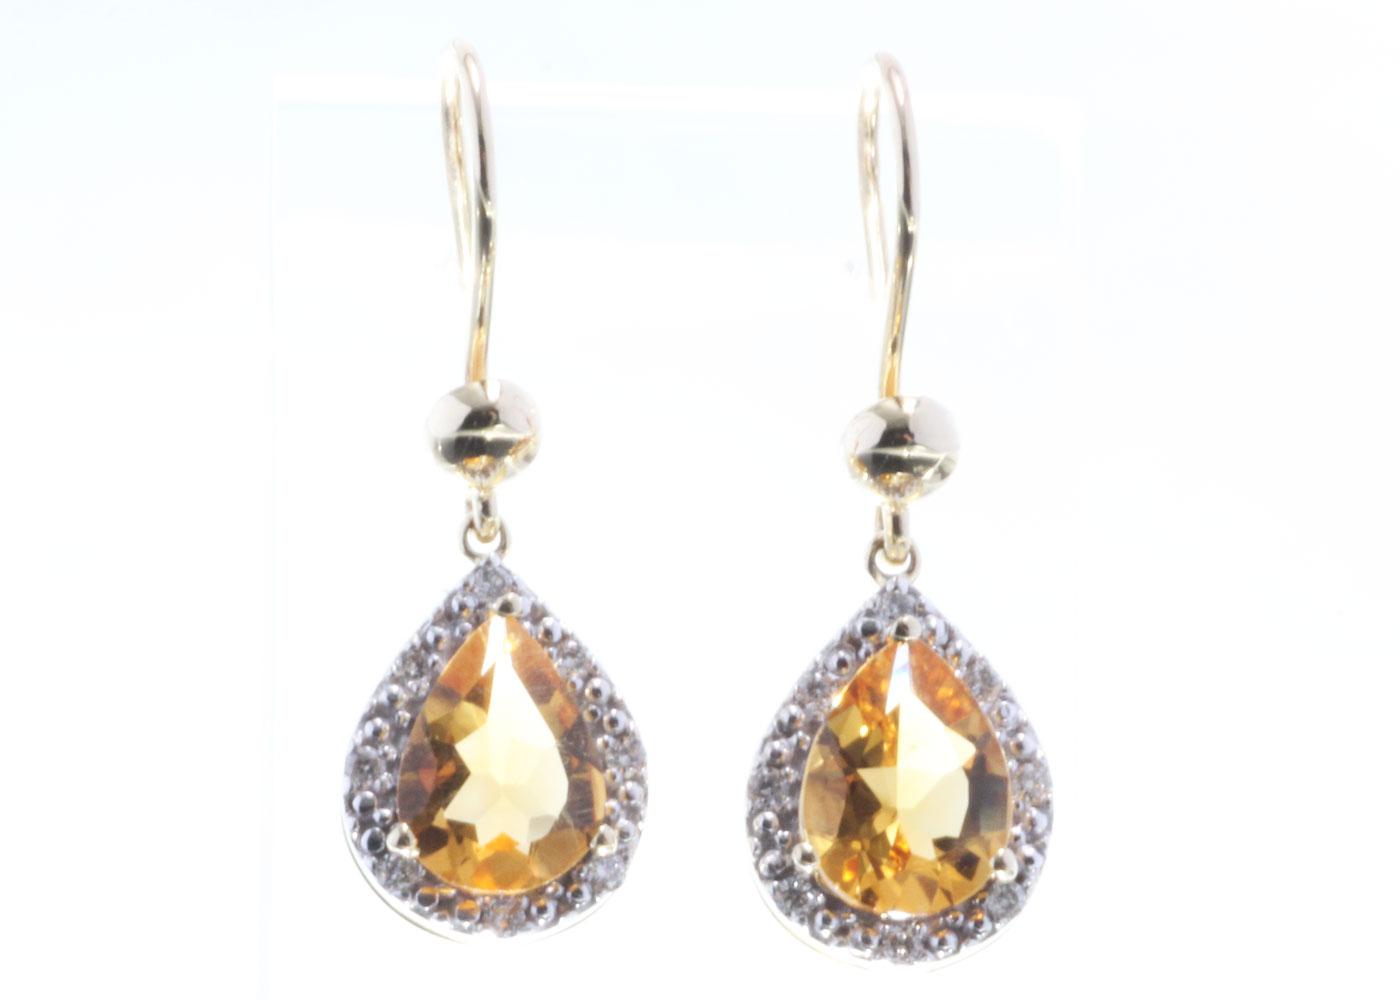 Lot 45 - 9ct Yellow Gold Citrine Diamond Earring 0.13 Carats